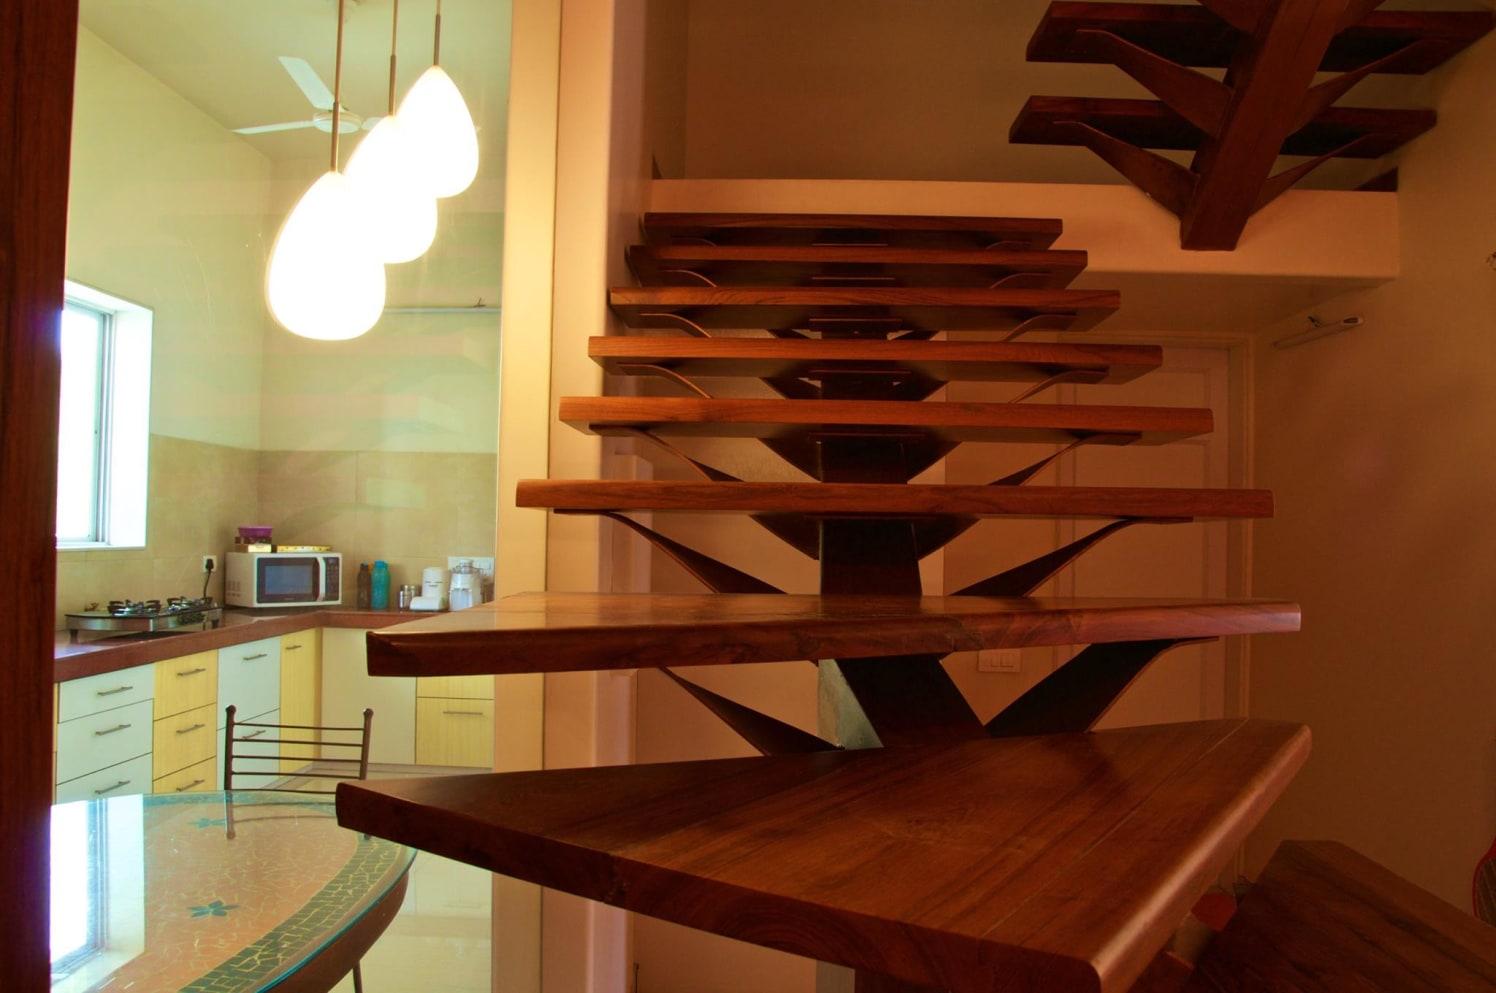 Edgy Staircase with Wooden Floor by Viraf Laskari  Indoor-spaces Minimalistic   Interior Design Photos & Ideas